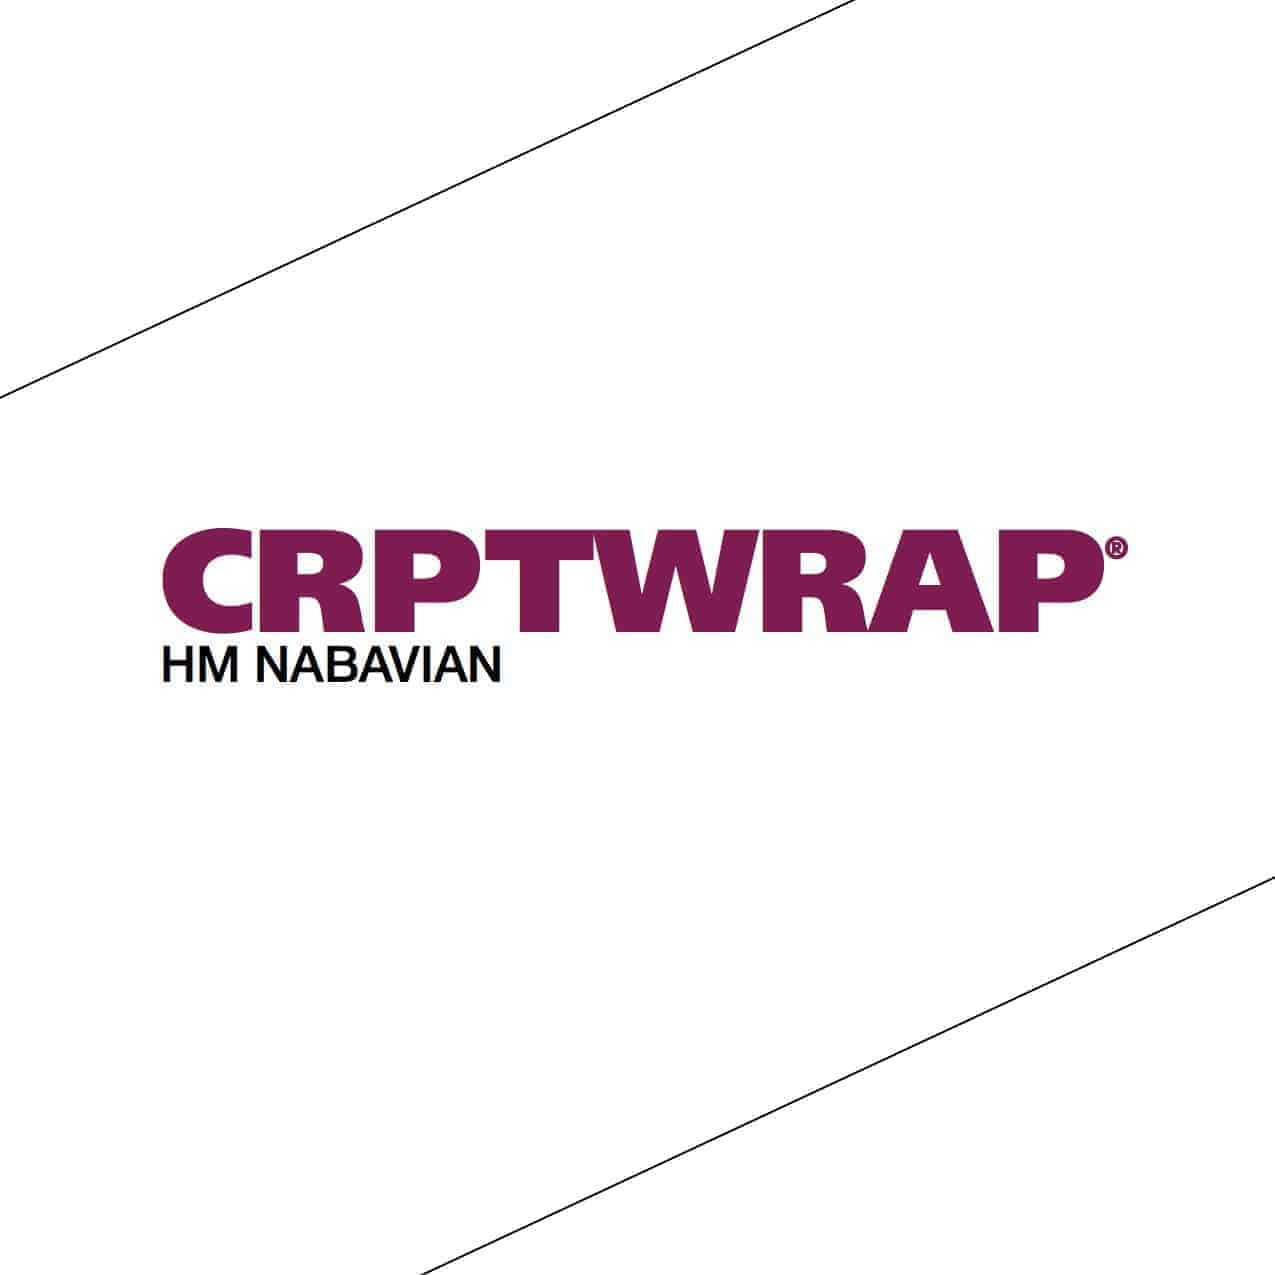 CRPTWRAP™